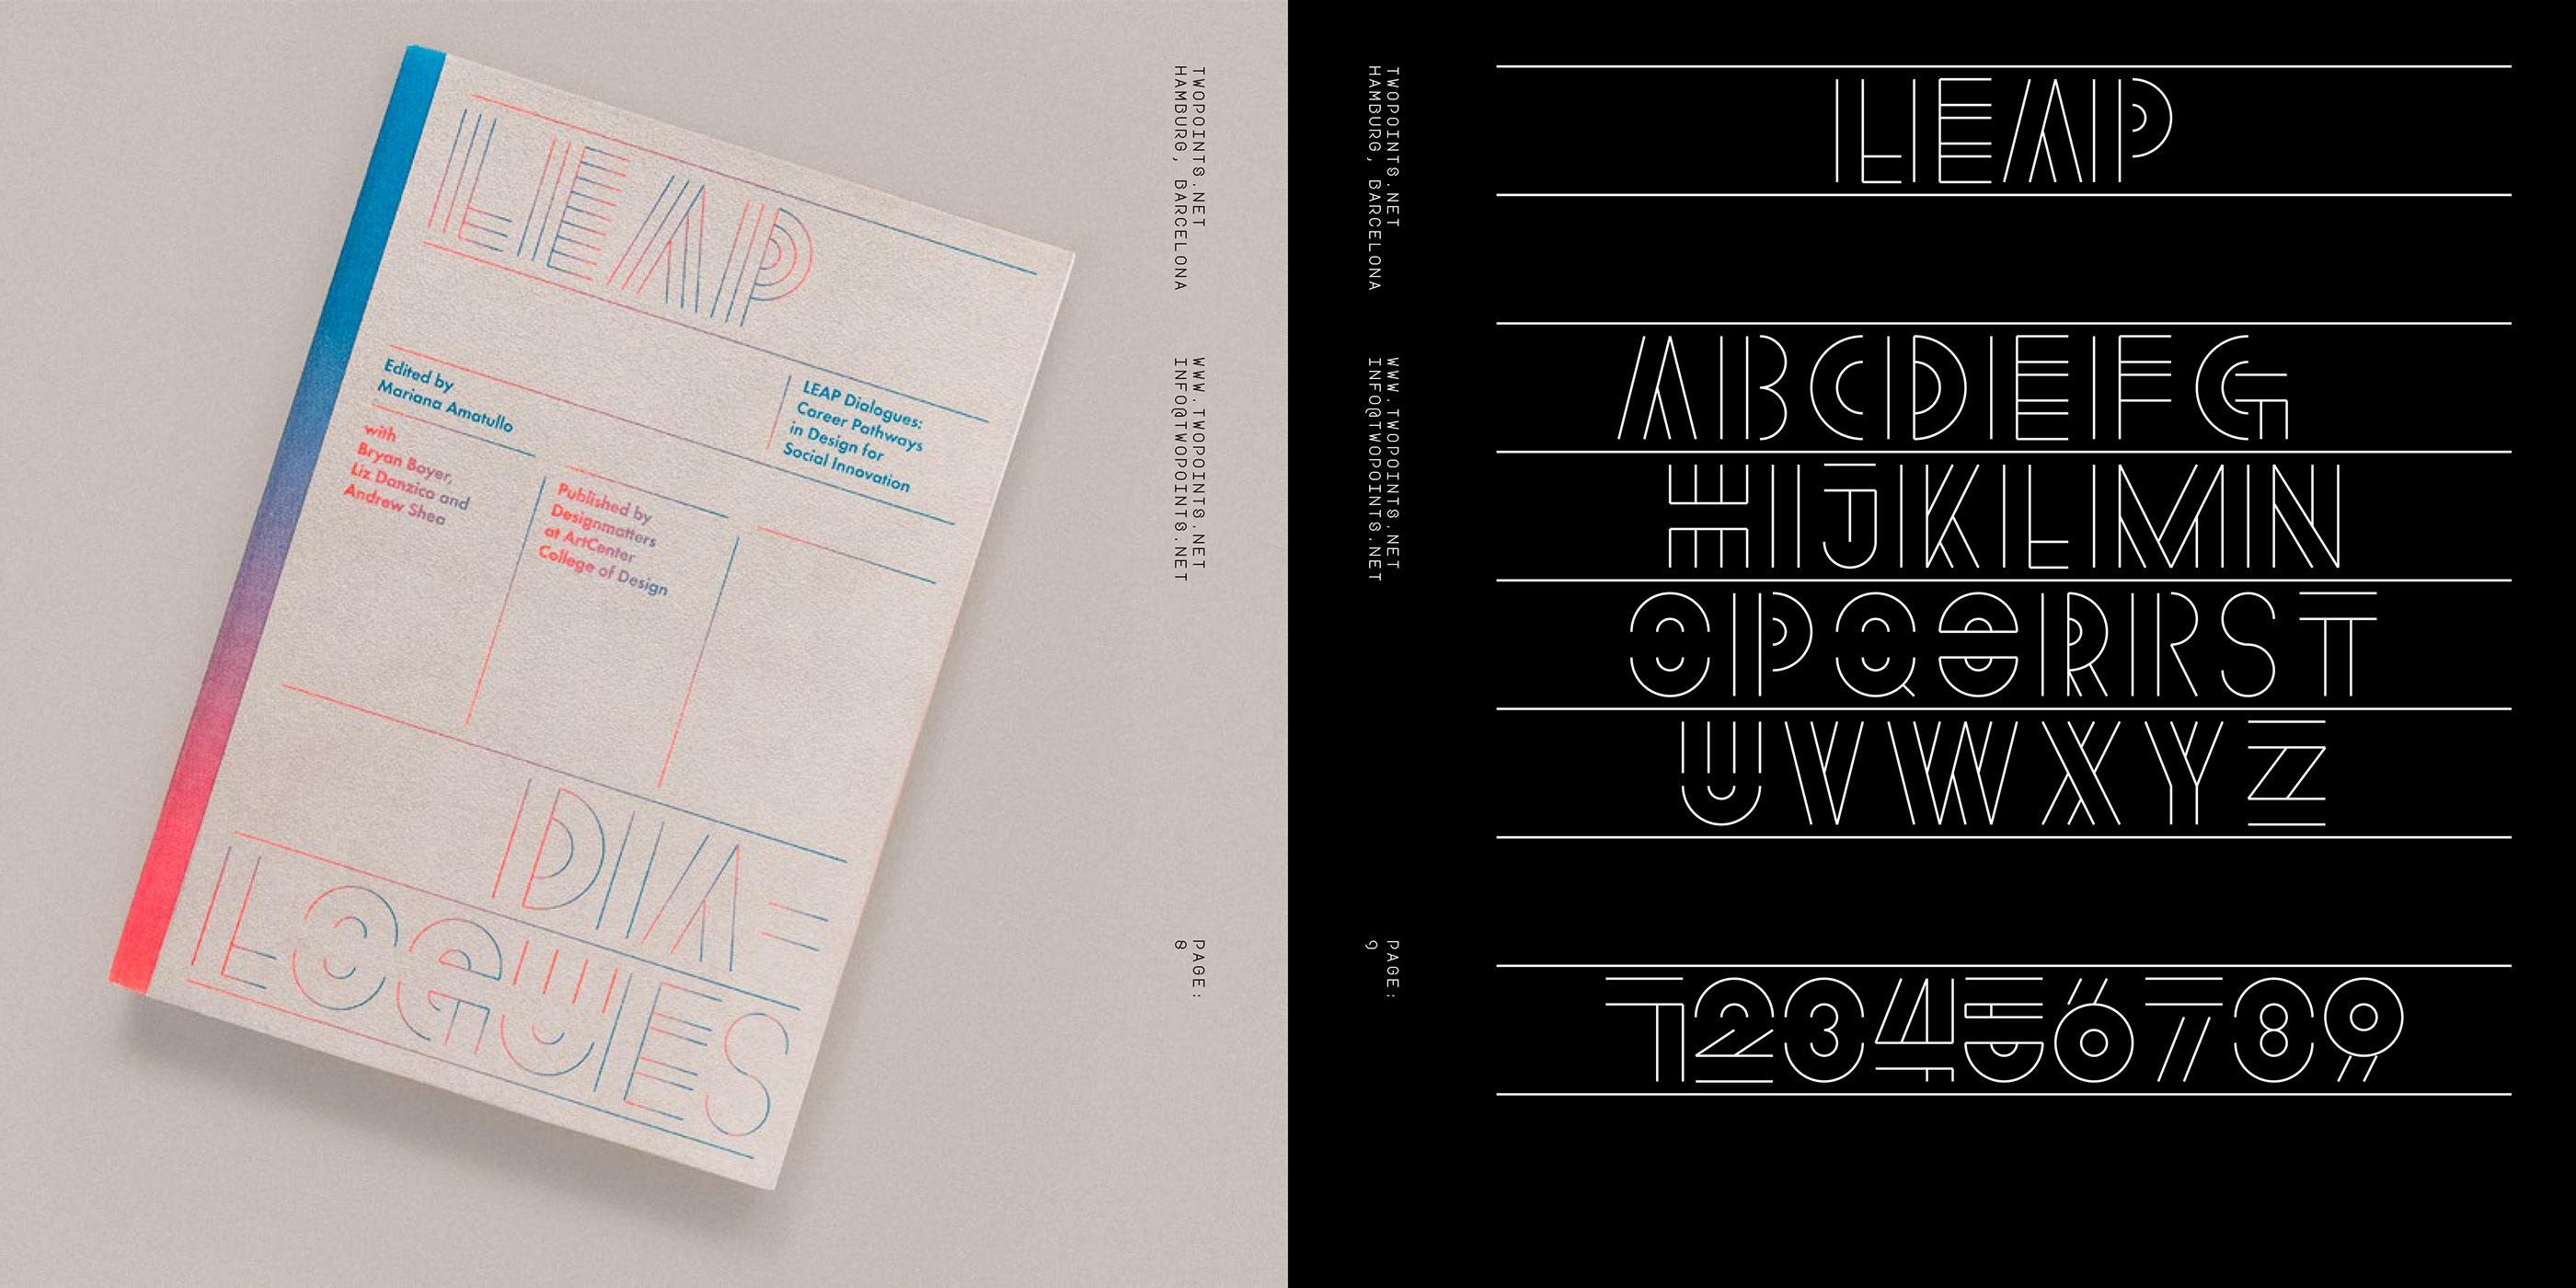 Tpn Type Design 2019 On Behance